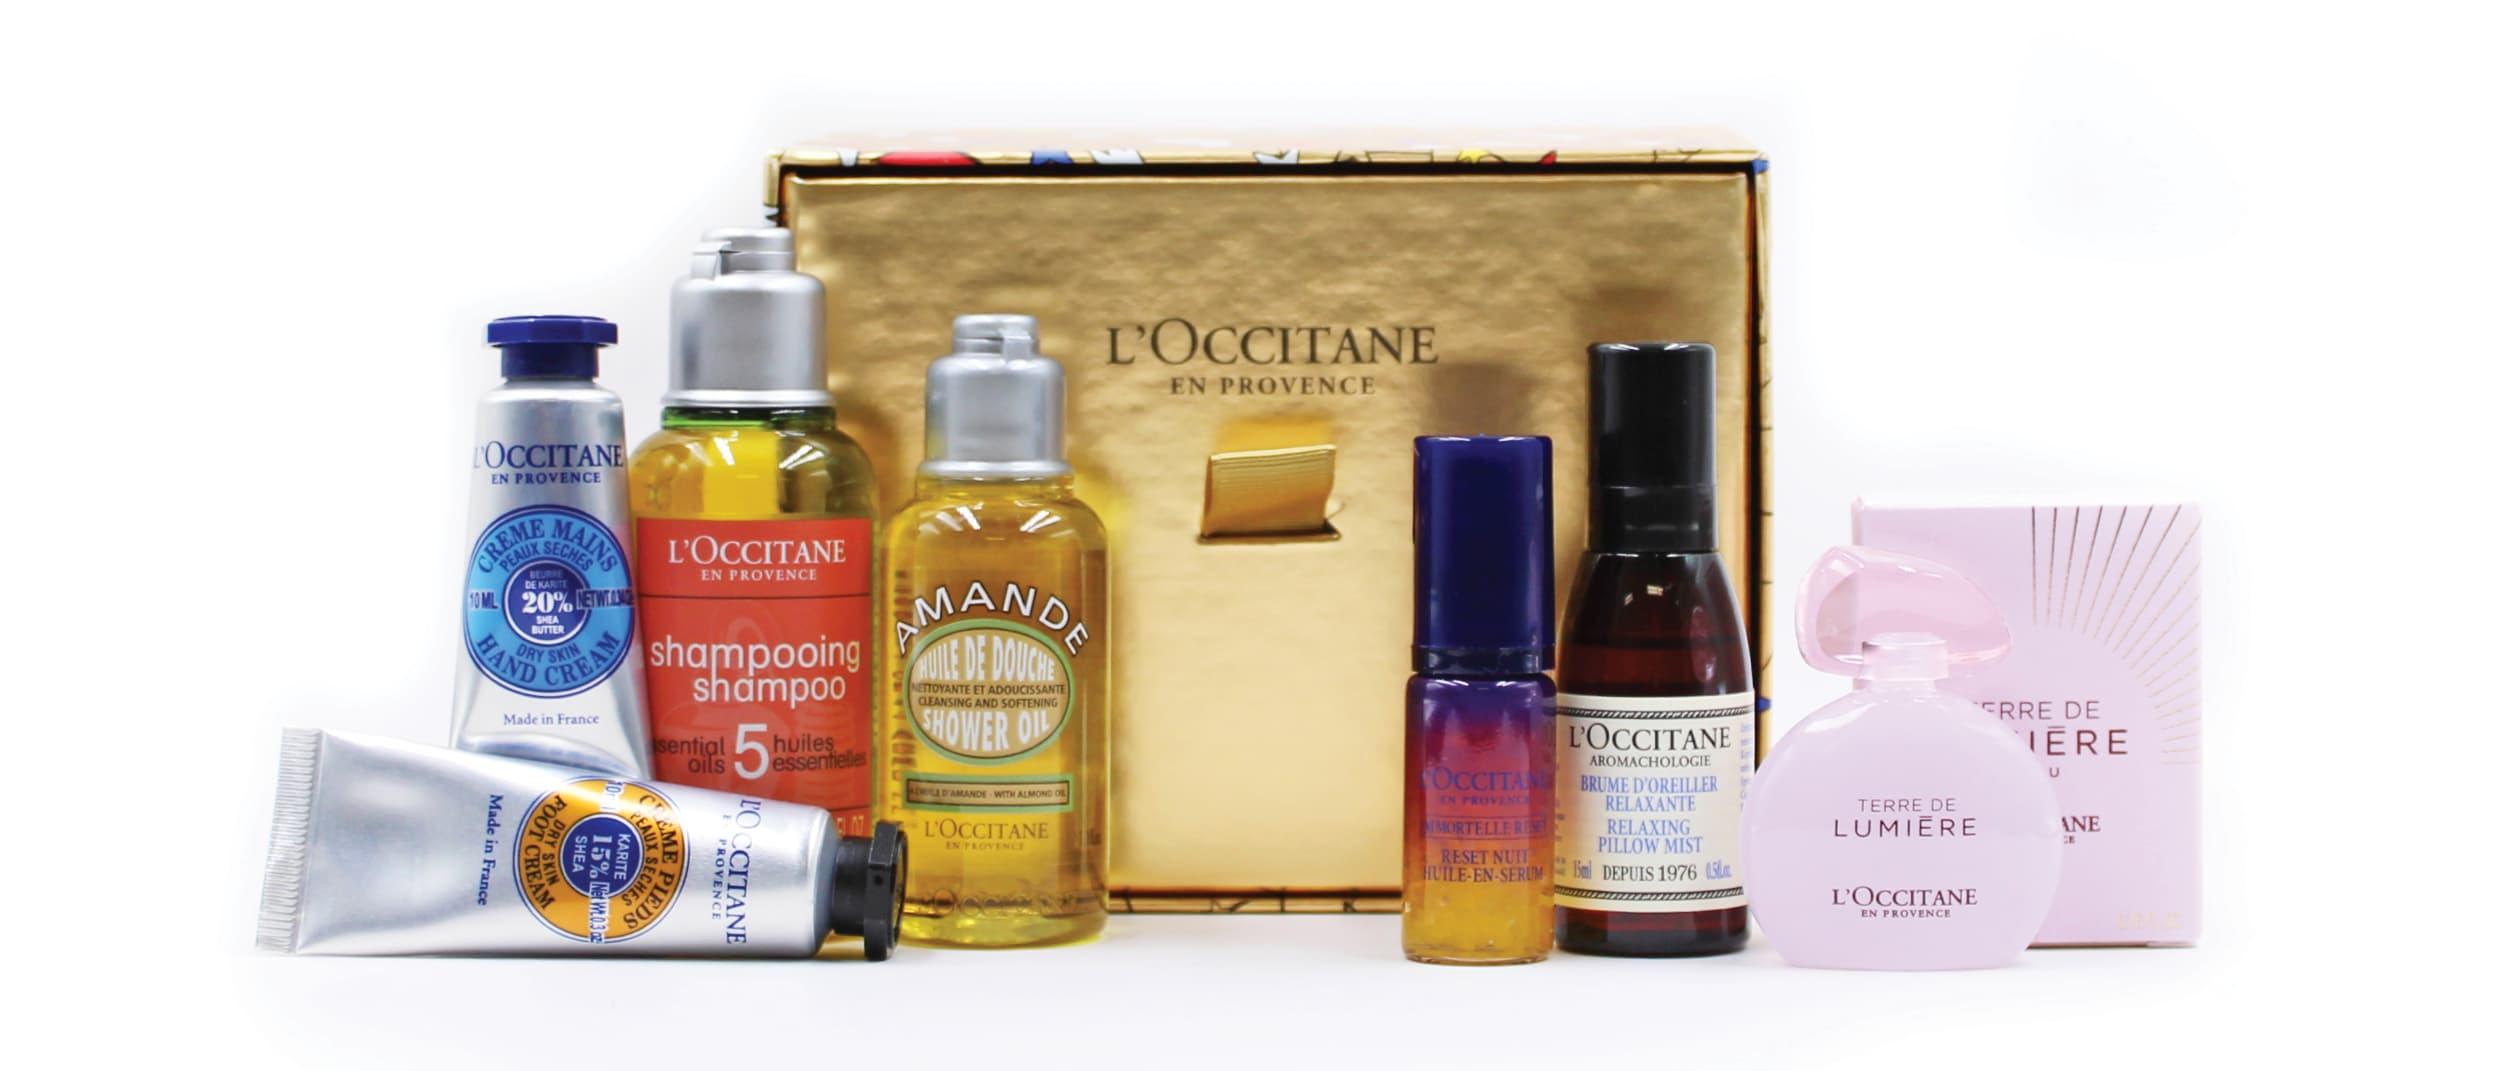 L'OCCITANE: receive Magic of Provence Collection for half price